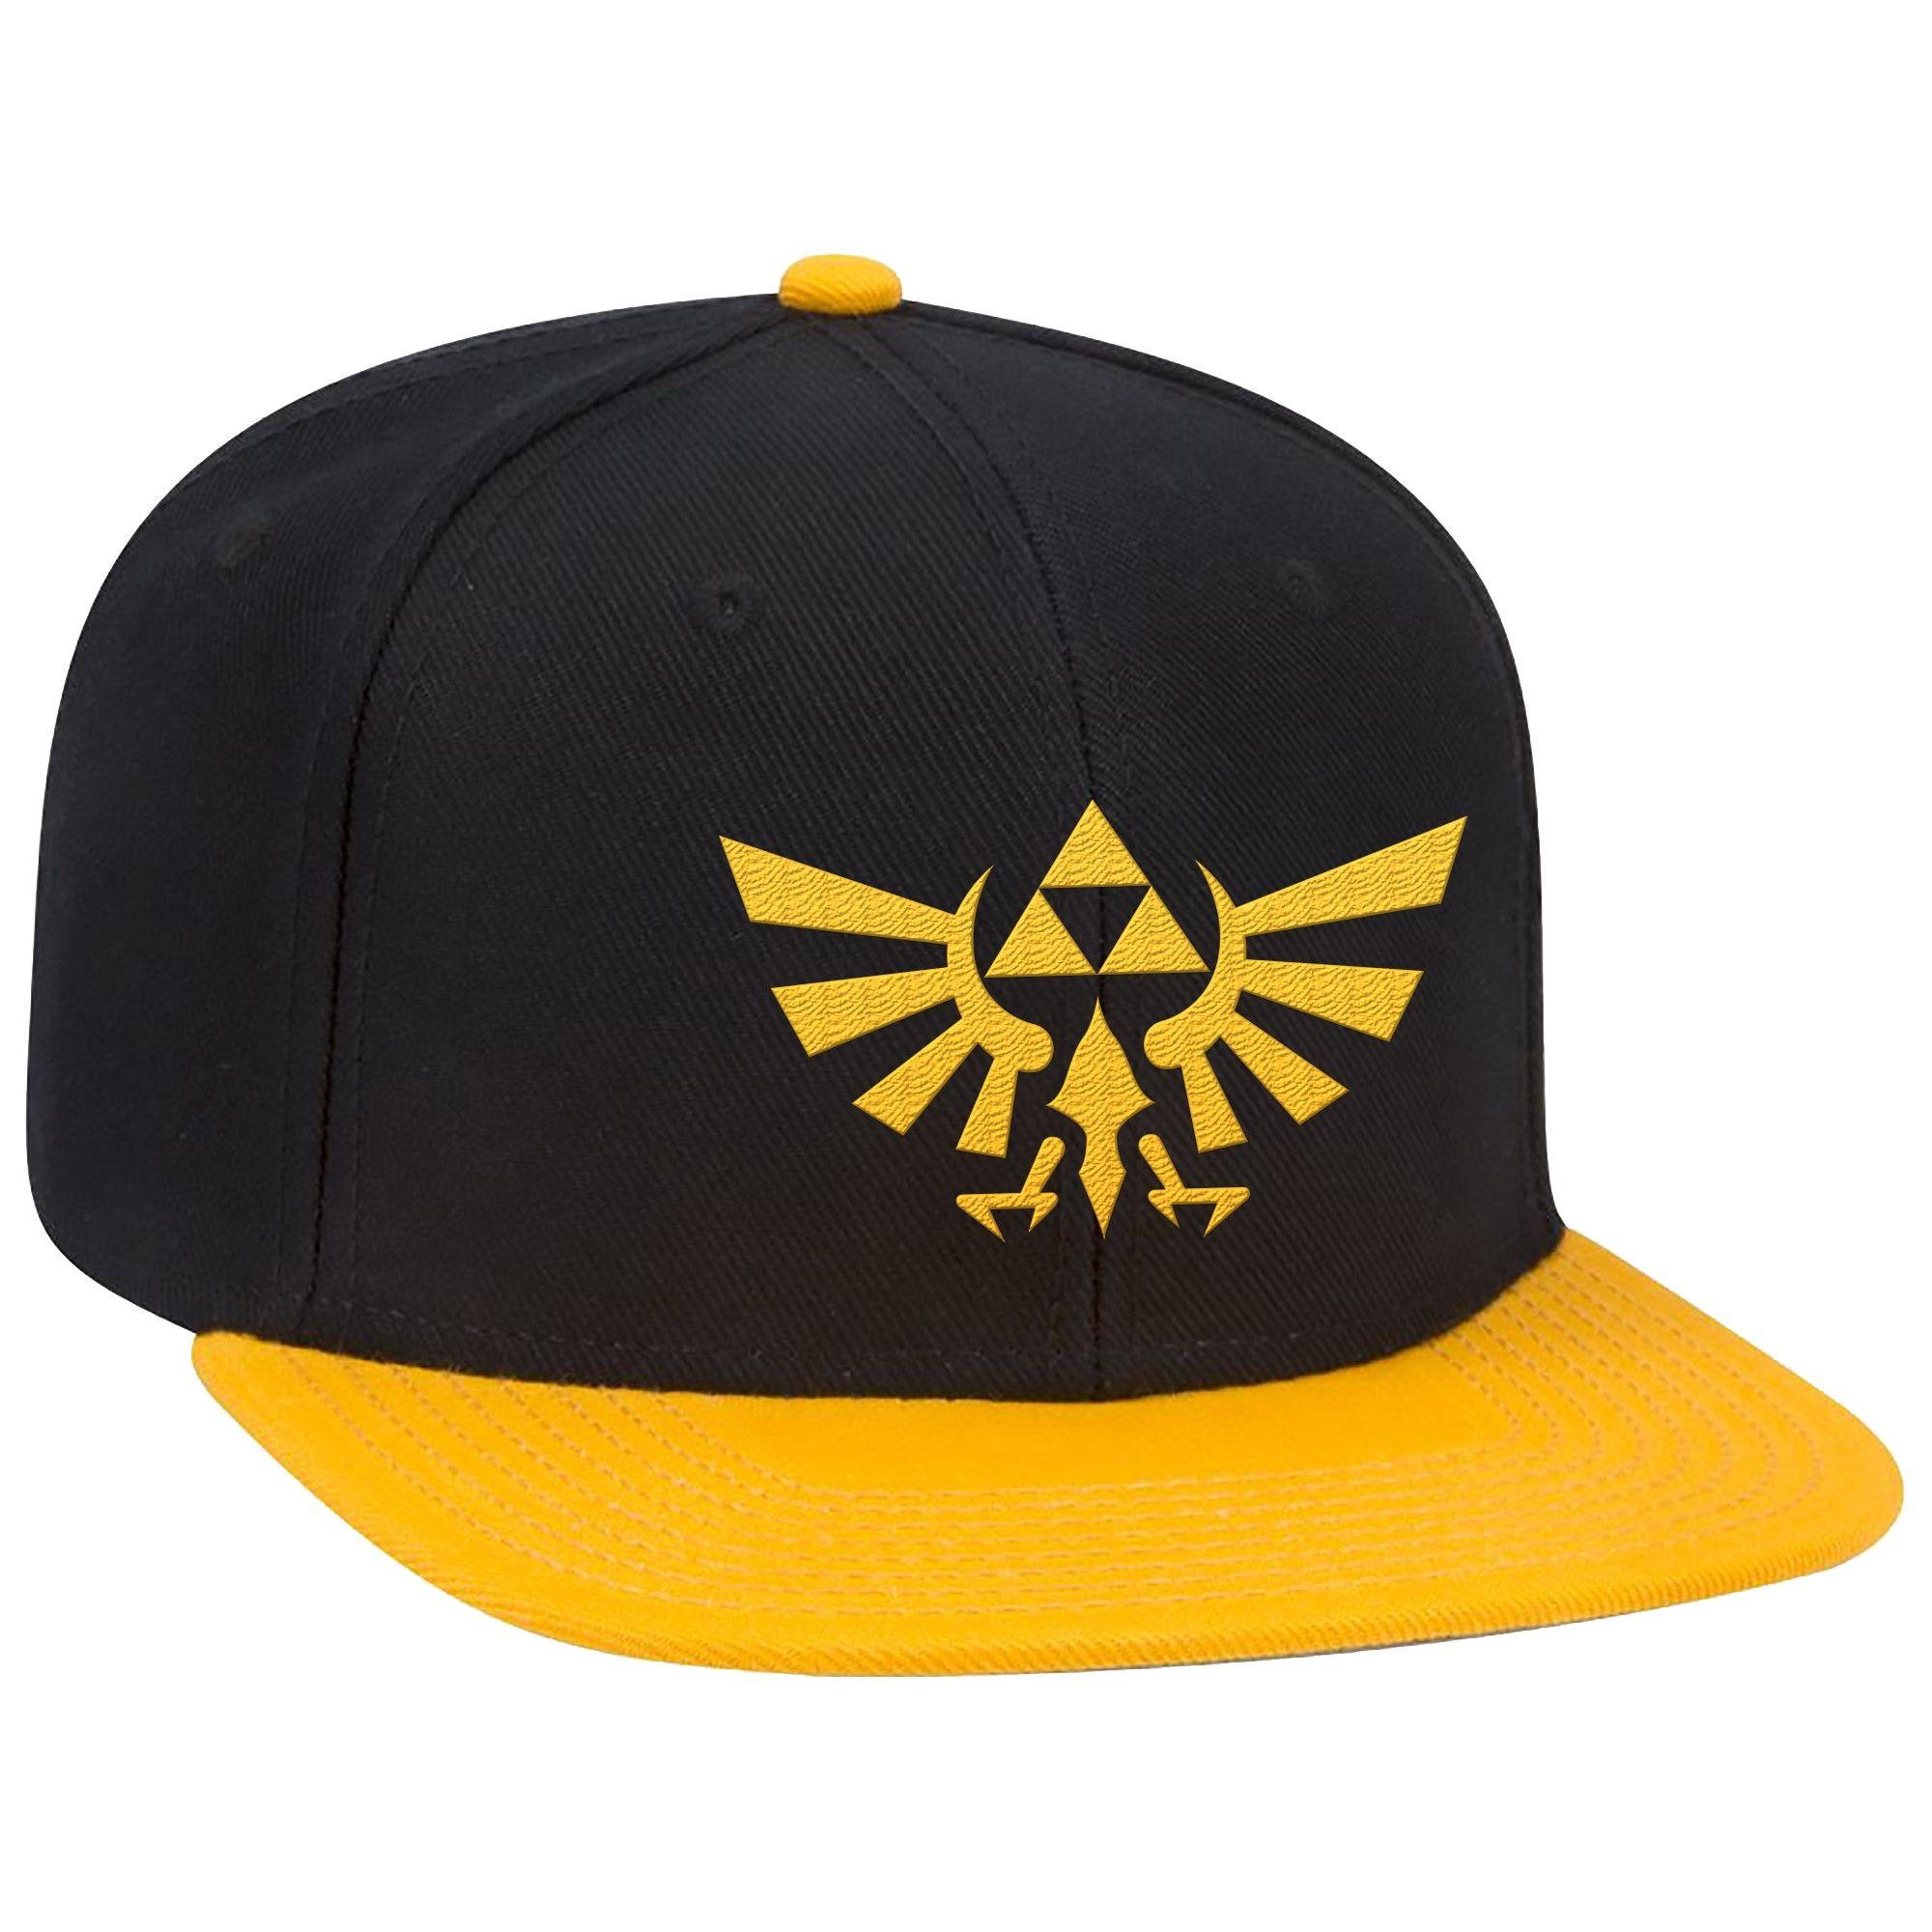 883c20c176c The Legend of Zelda  Hyrule Crest Brimmed Hat - Black Yellow